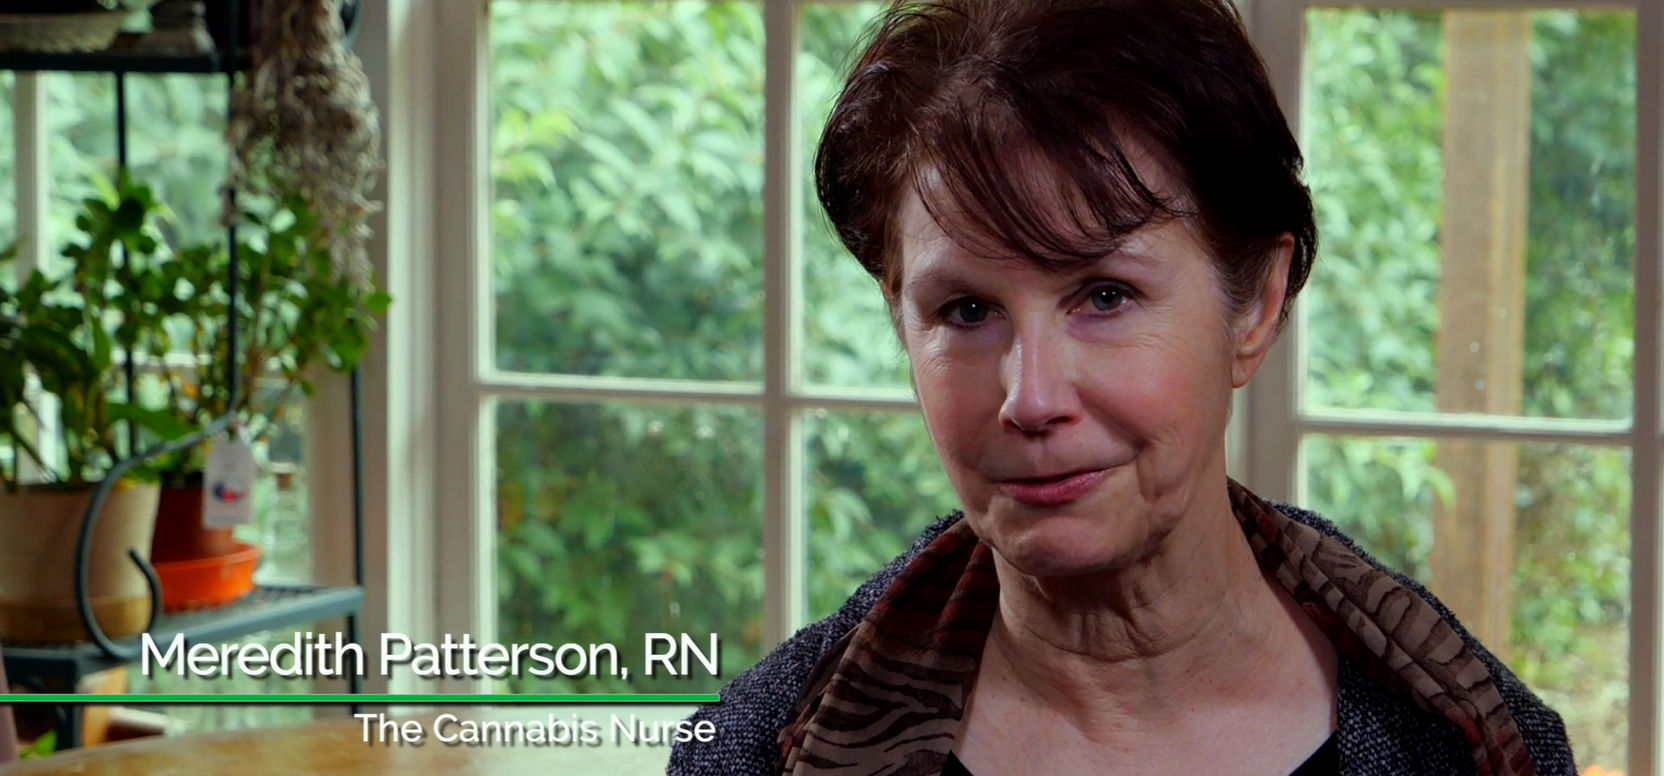 Meredith Patterson, the Cannabis Brain Nurse, introduces the CBN cannabinoid